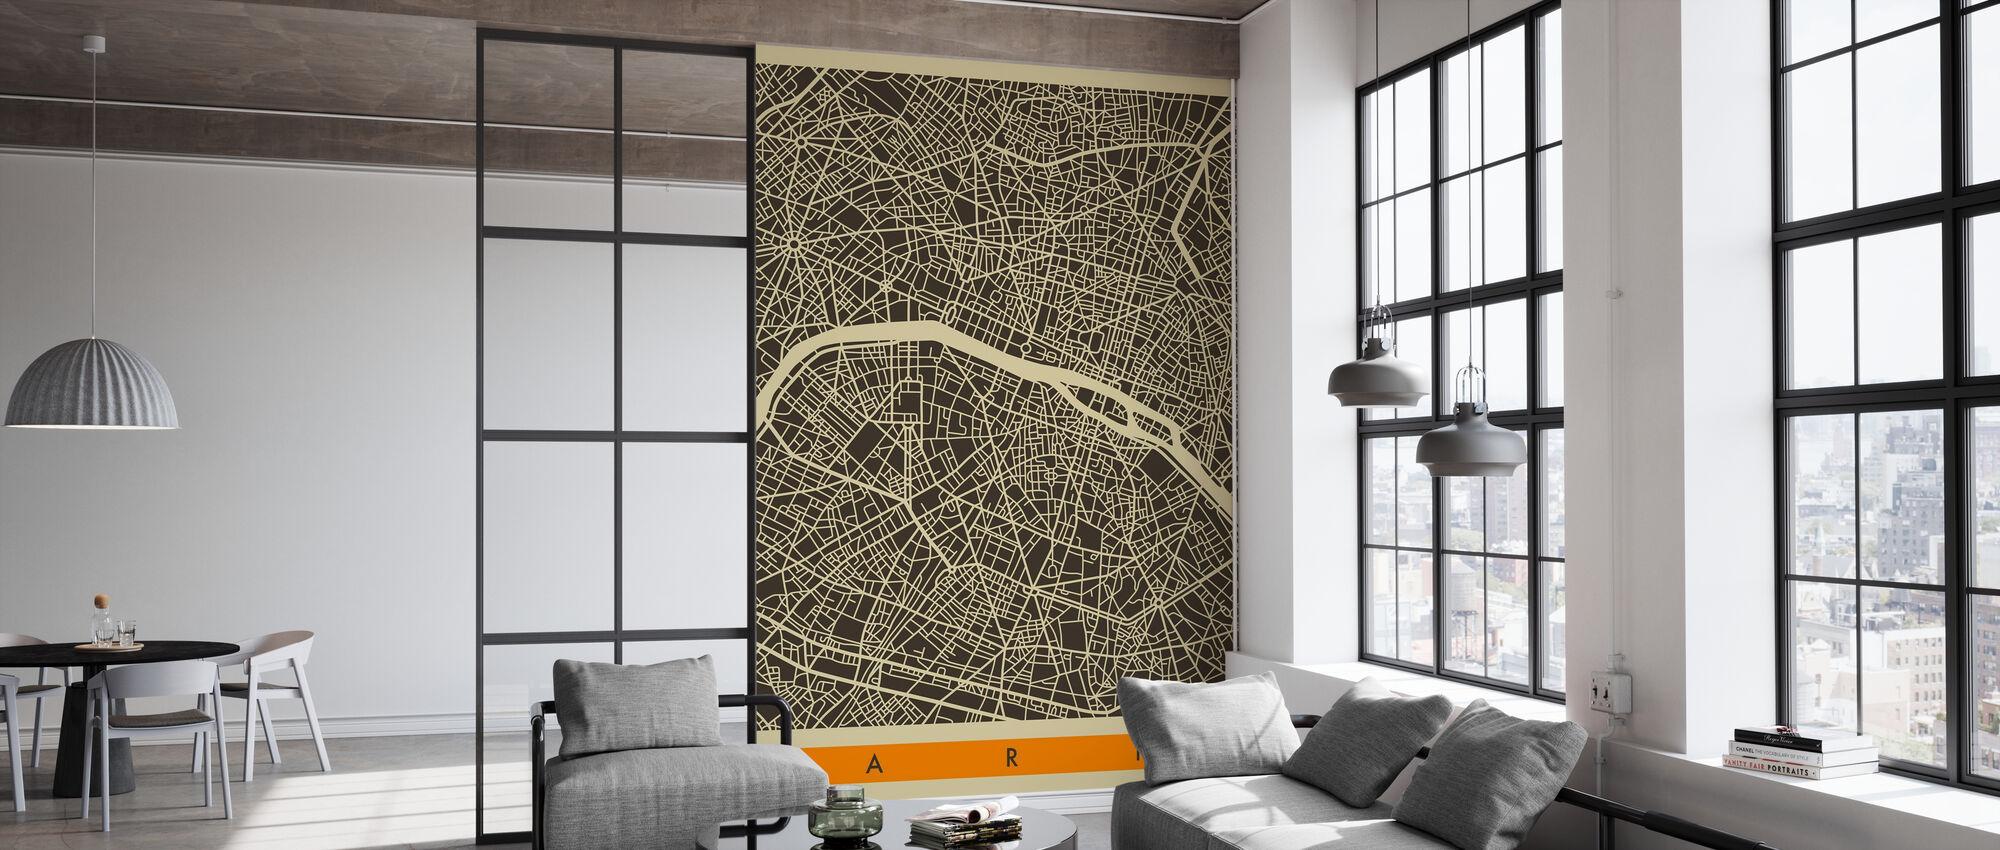 City Map - Paris - Wallpaper - Office